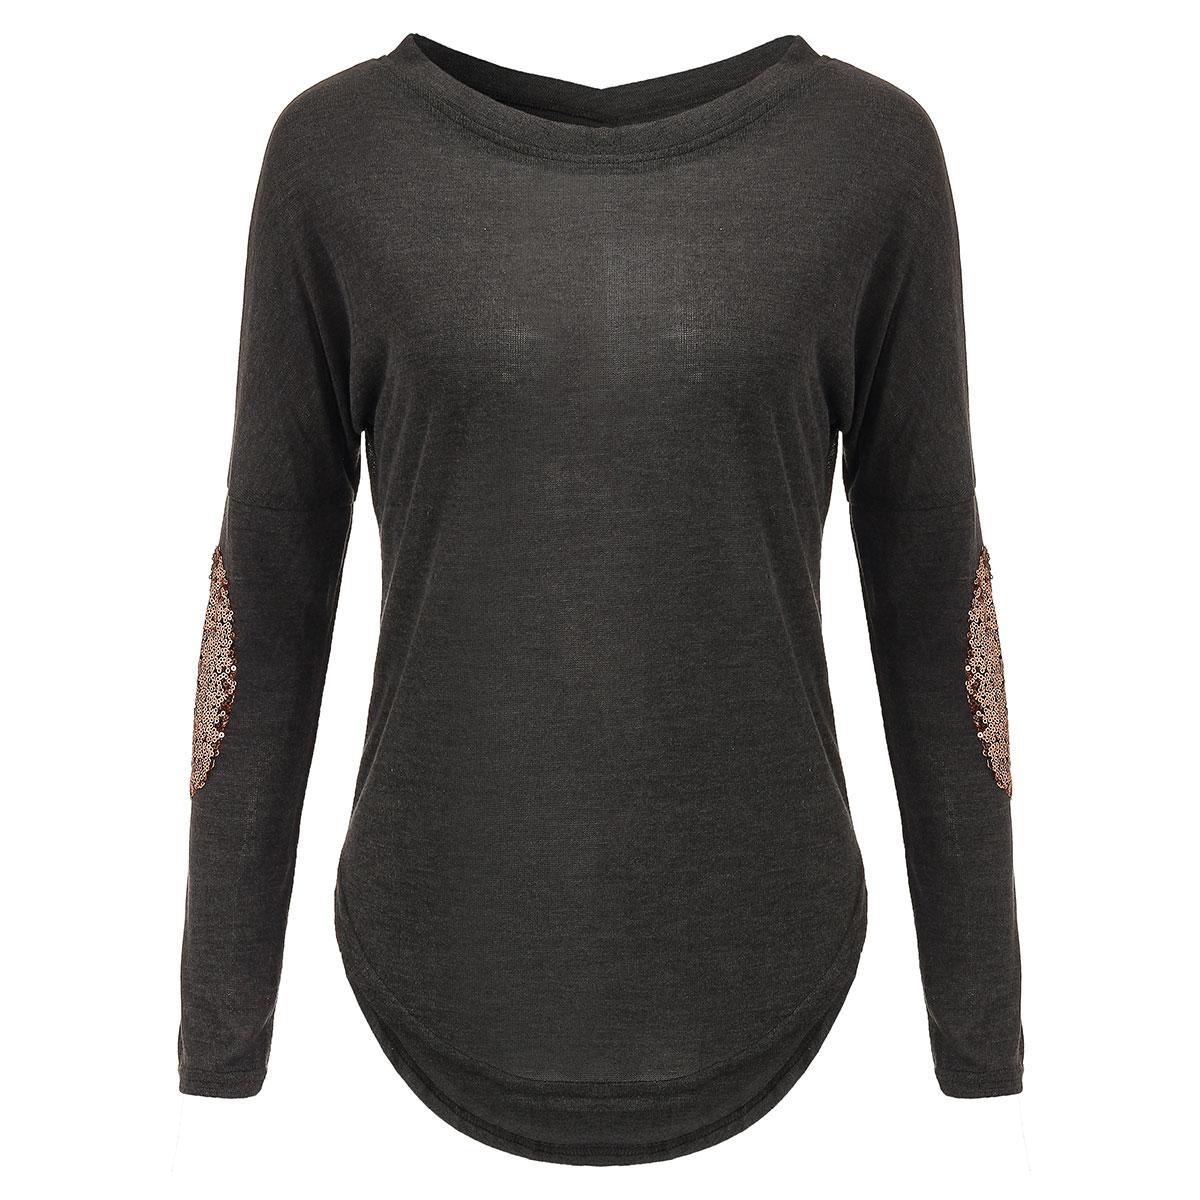 Zanzea women s sexy sheer shirt casual glitter stitching for Original stitch shirt review